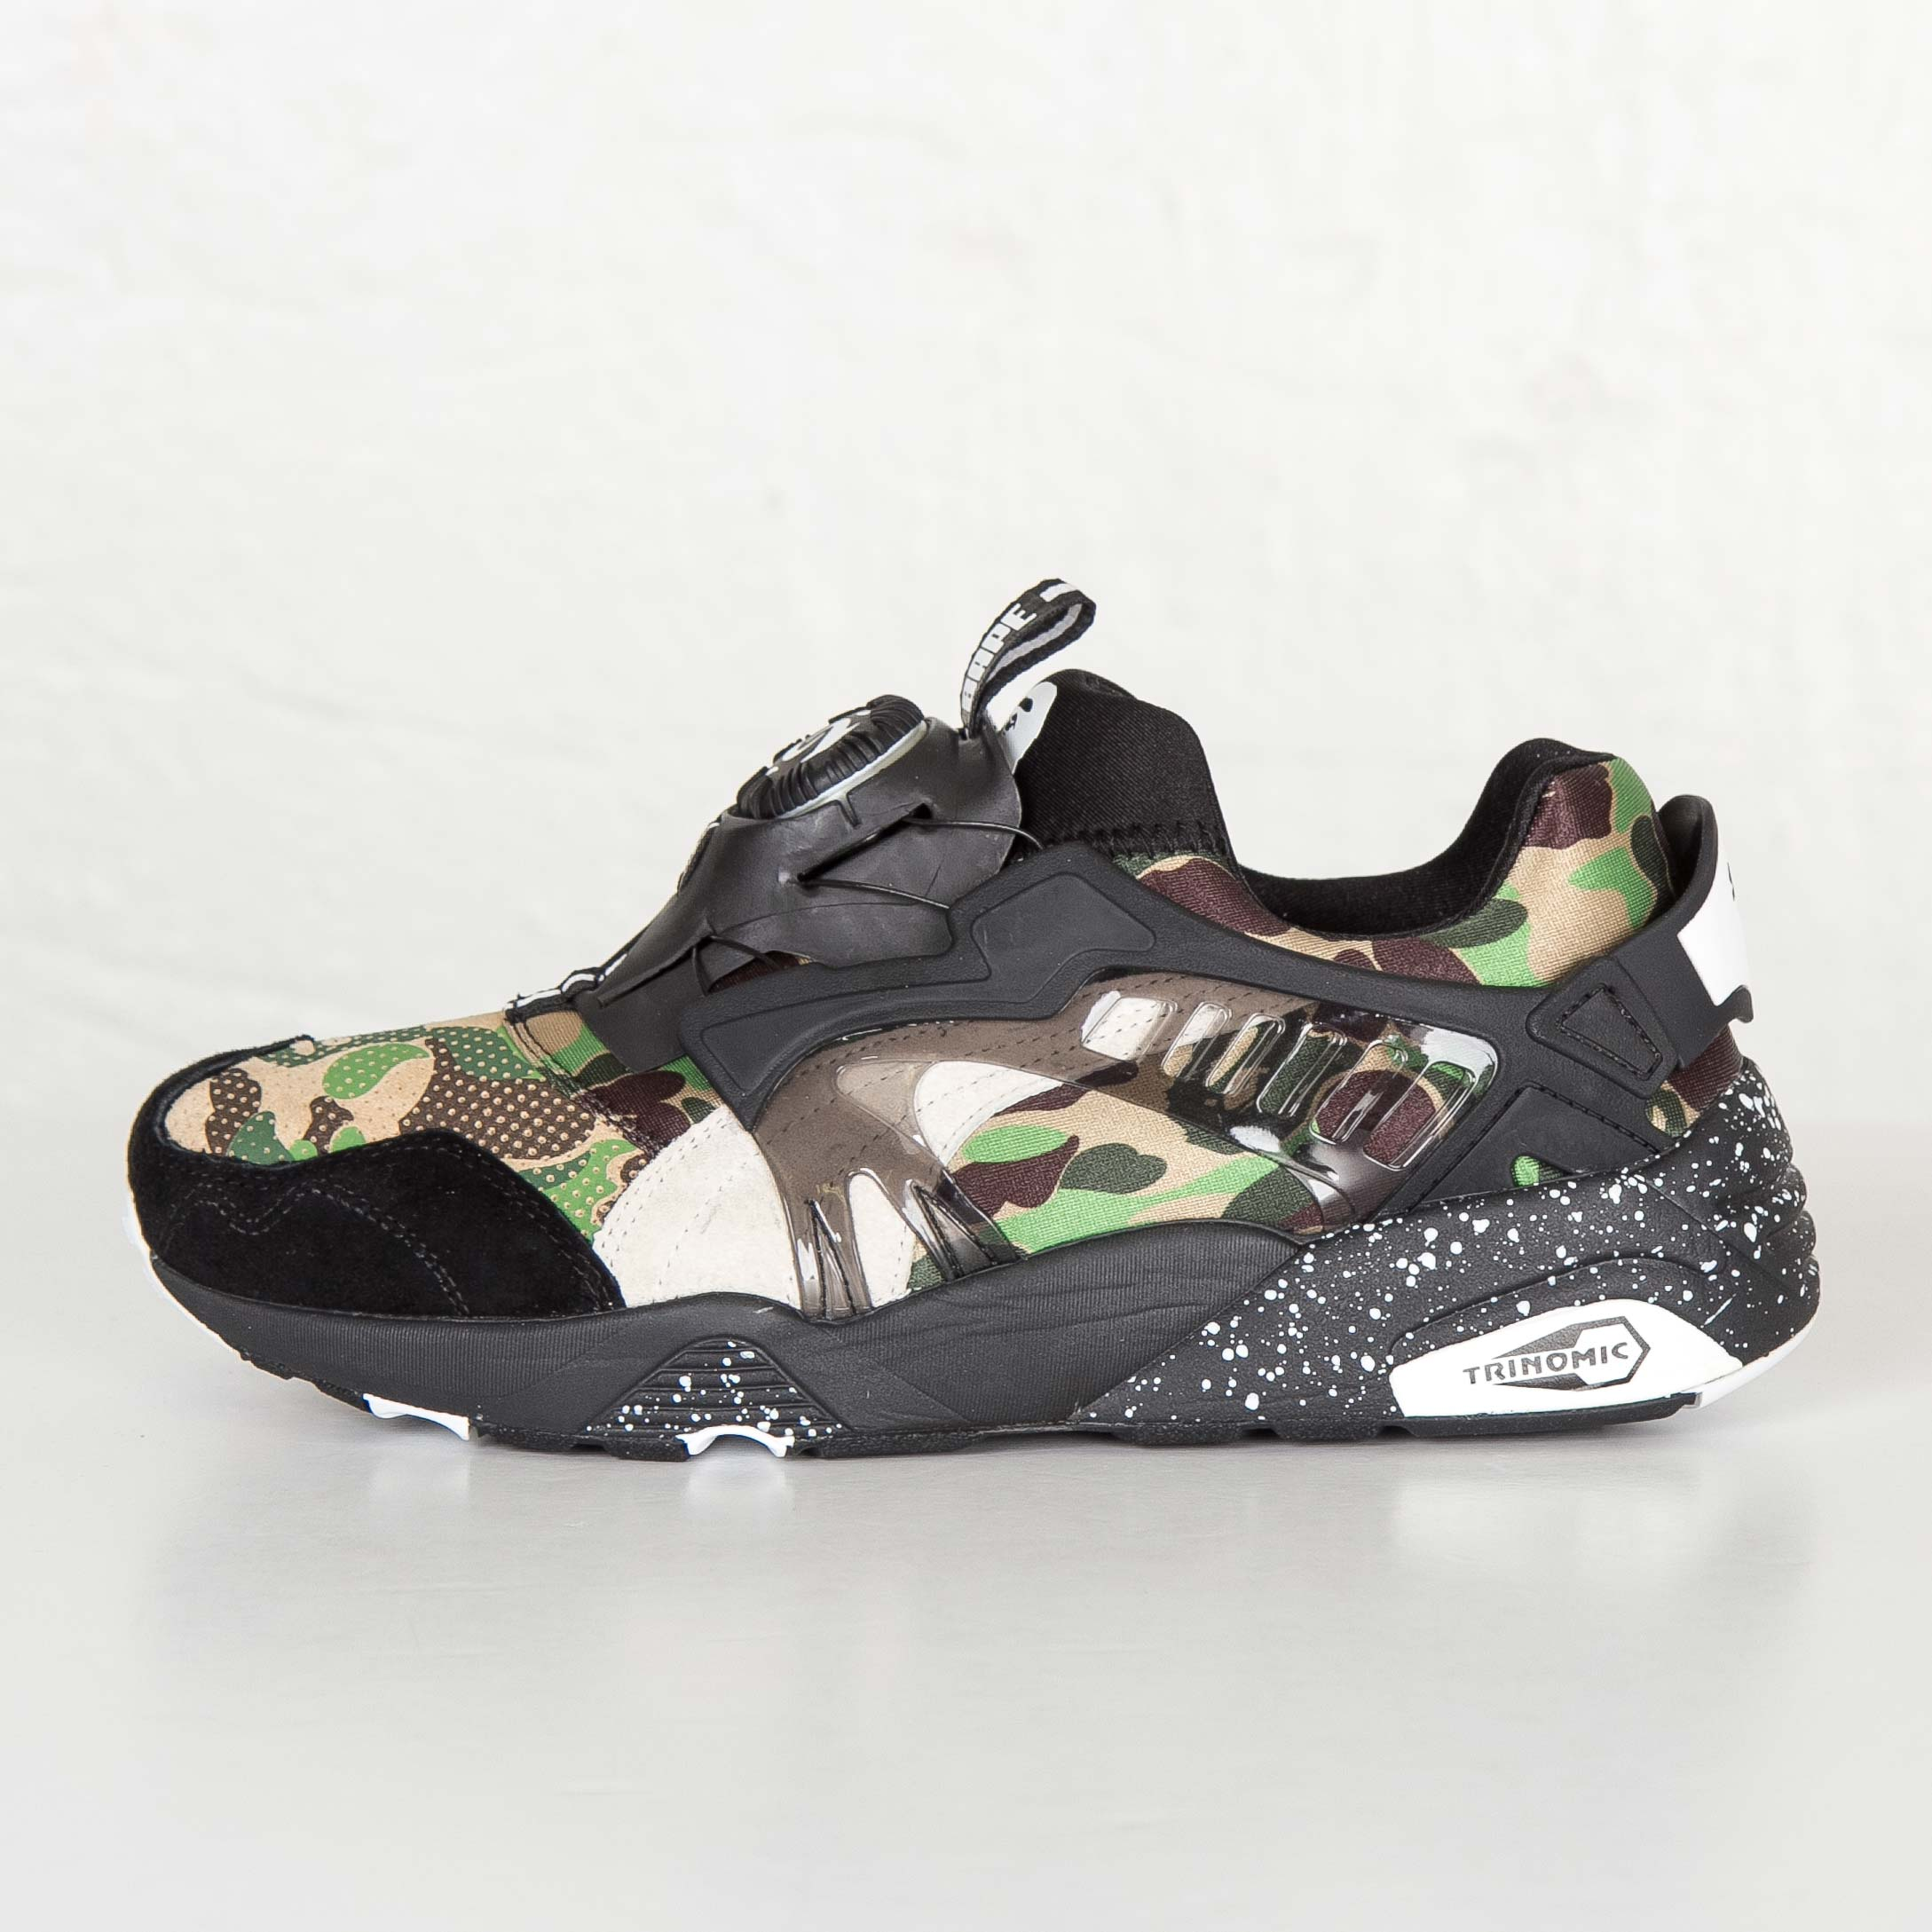 74d5acc0ed07e Puma Disc Blaze x Bape - 358846-01 - Sneakersnstuff | sneakers ...